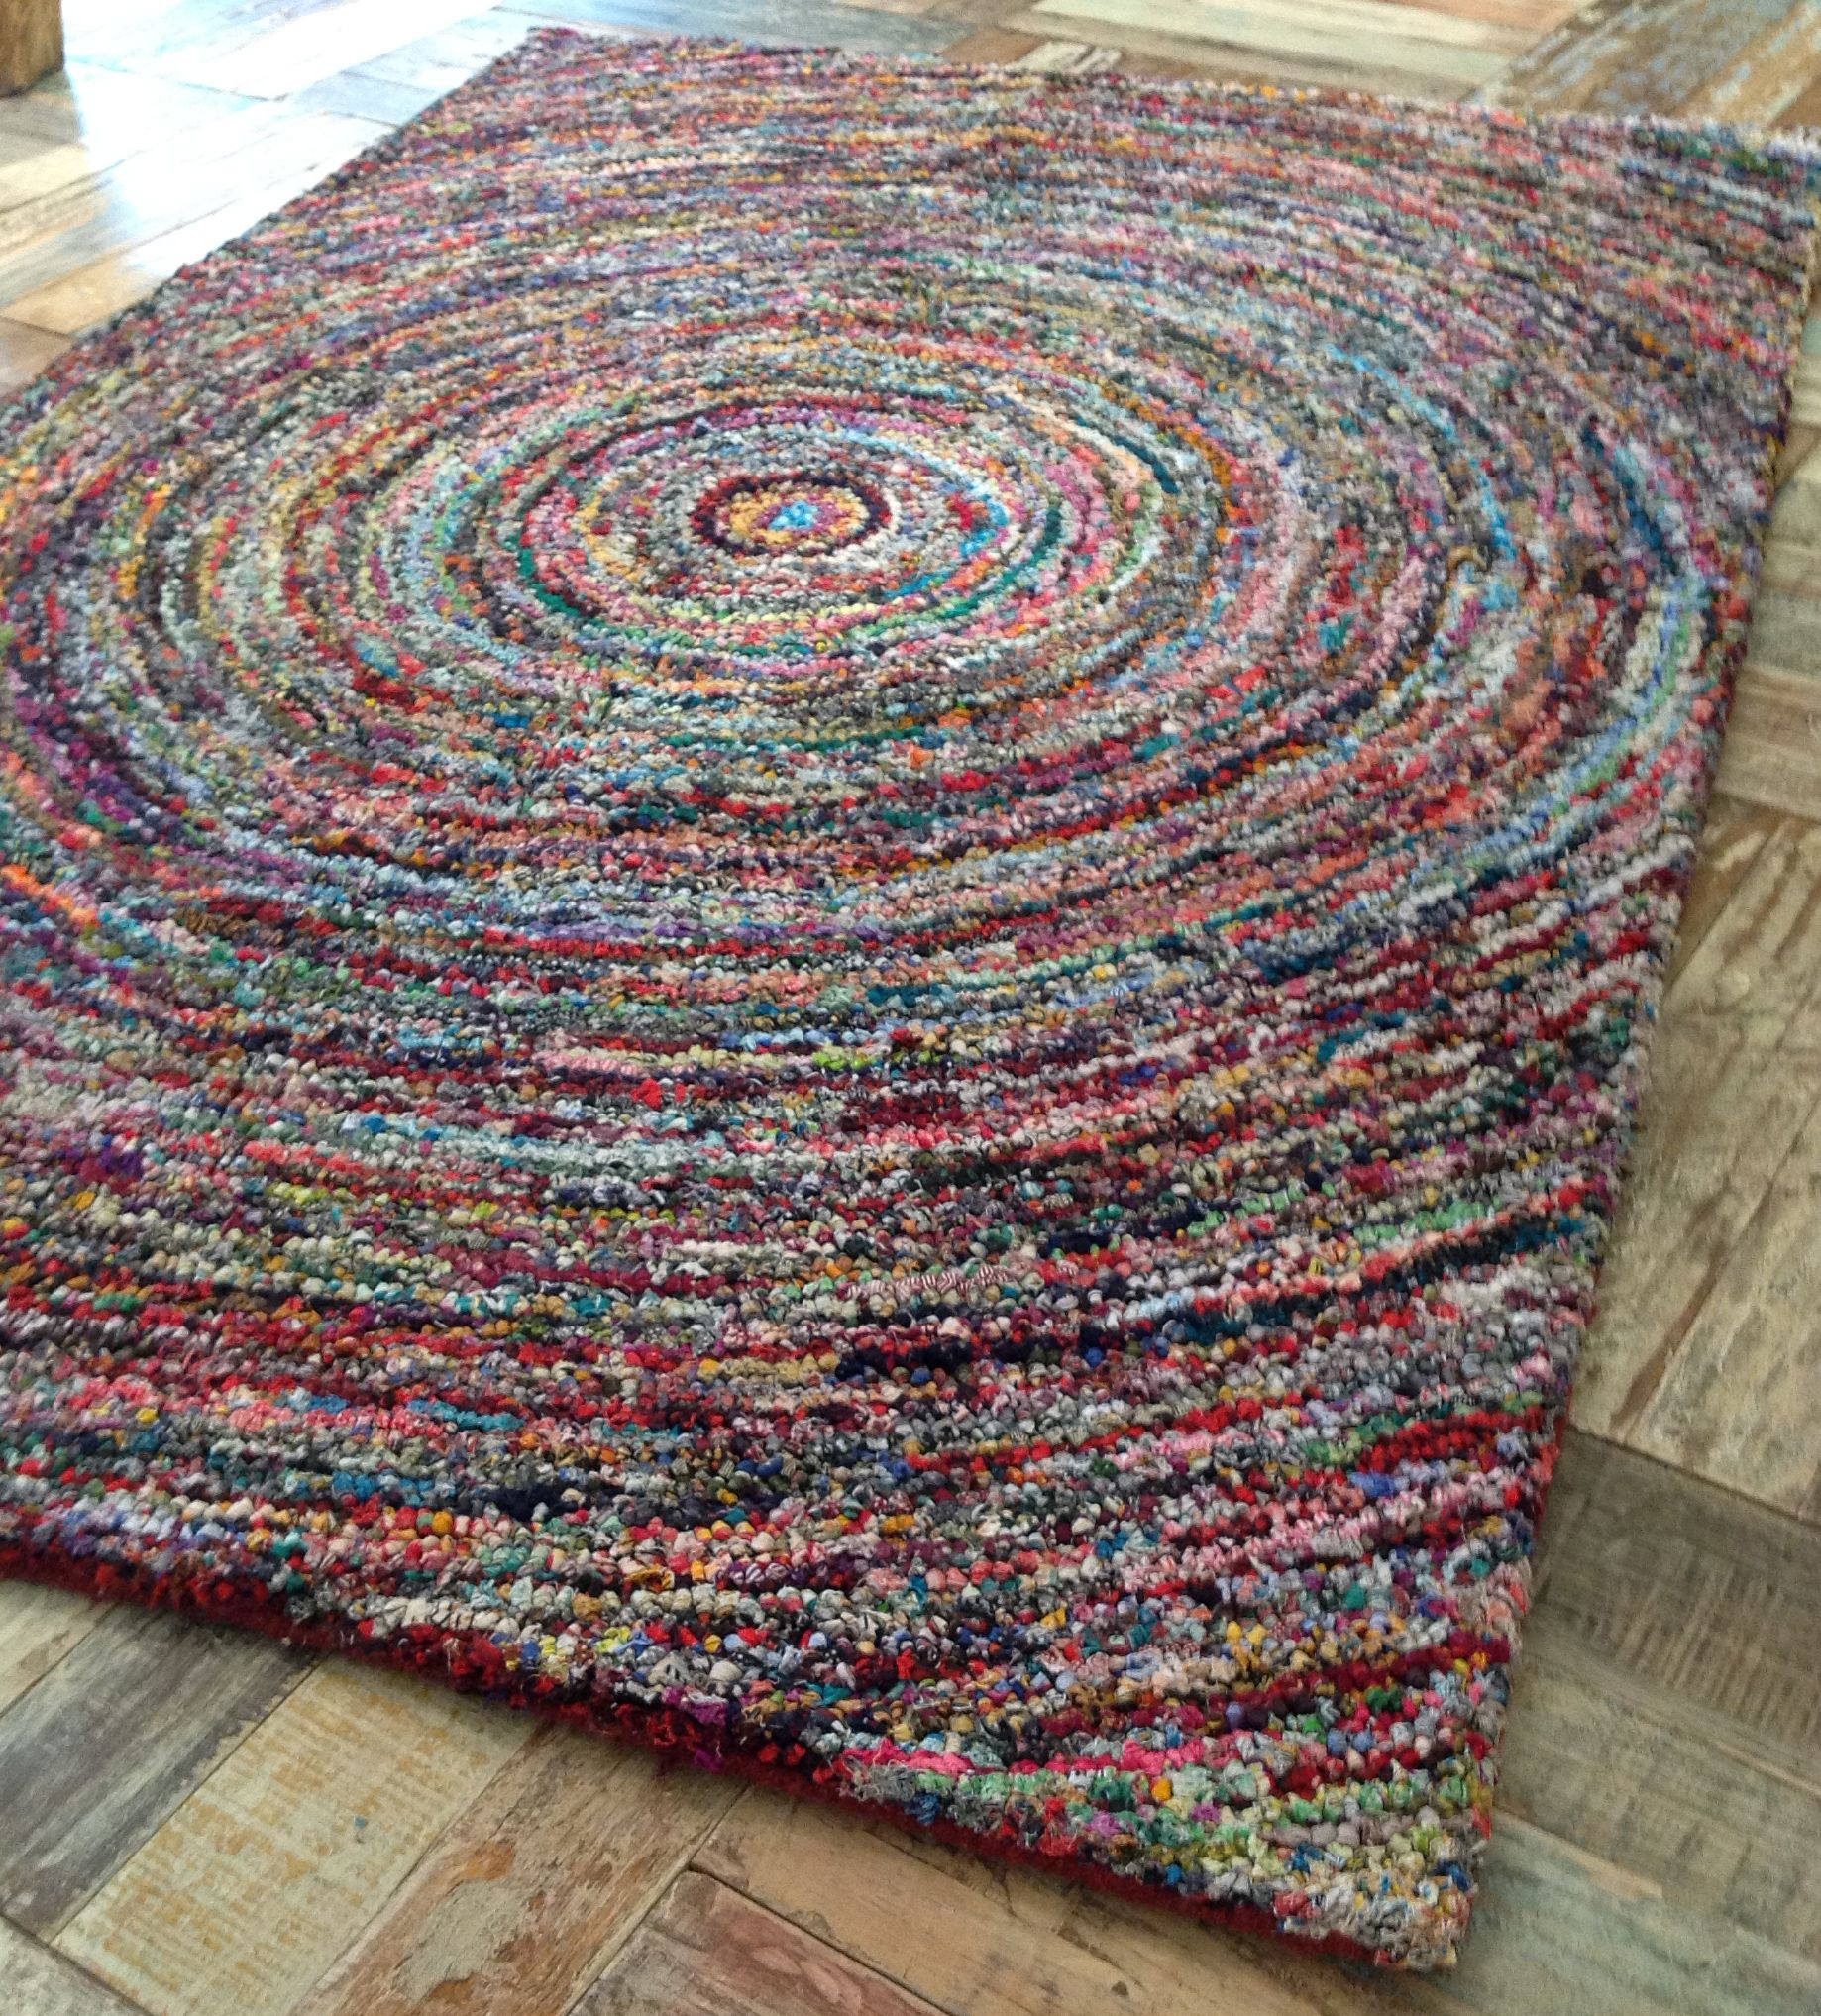 Rag rugs - Google Search RKLGGSX